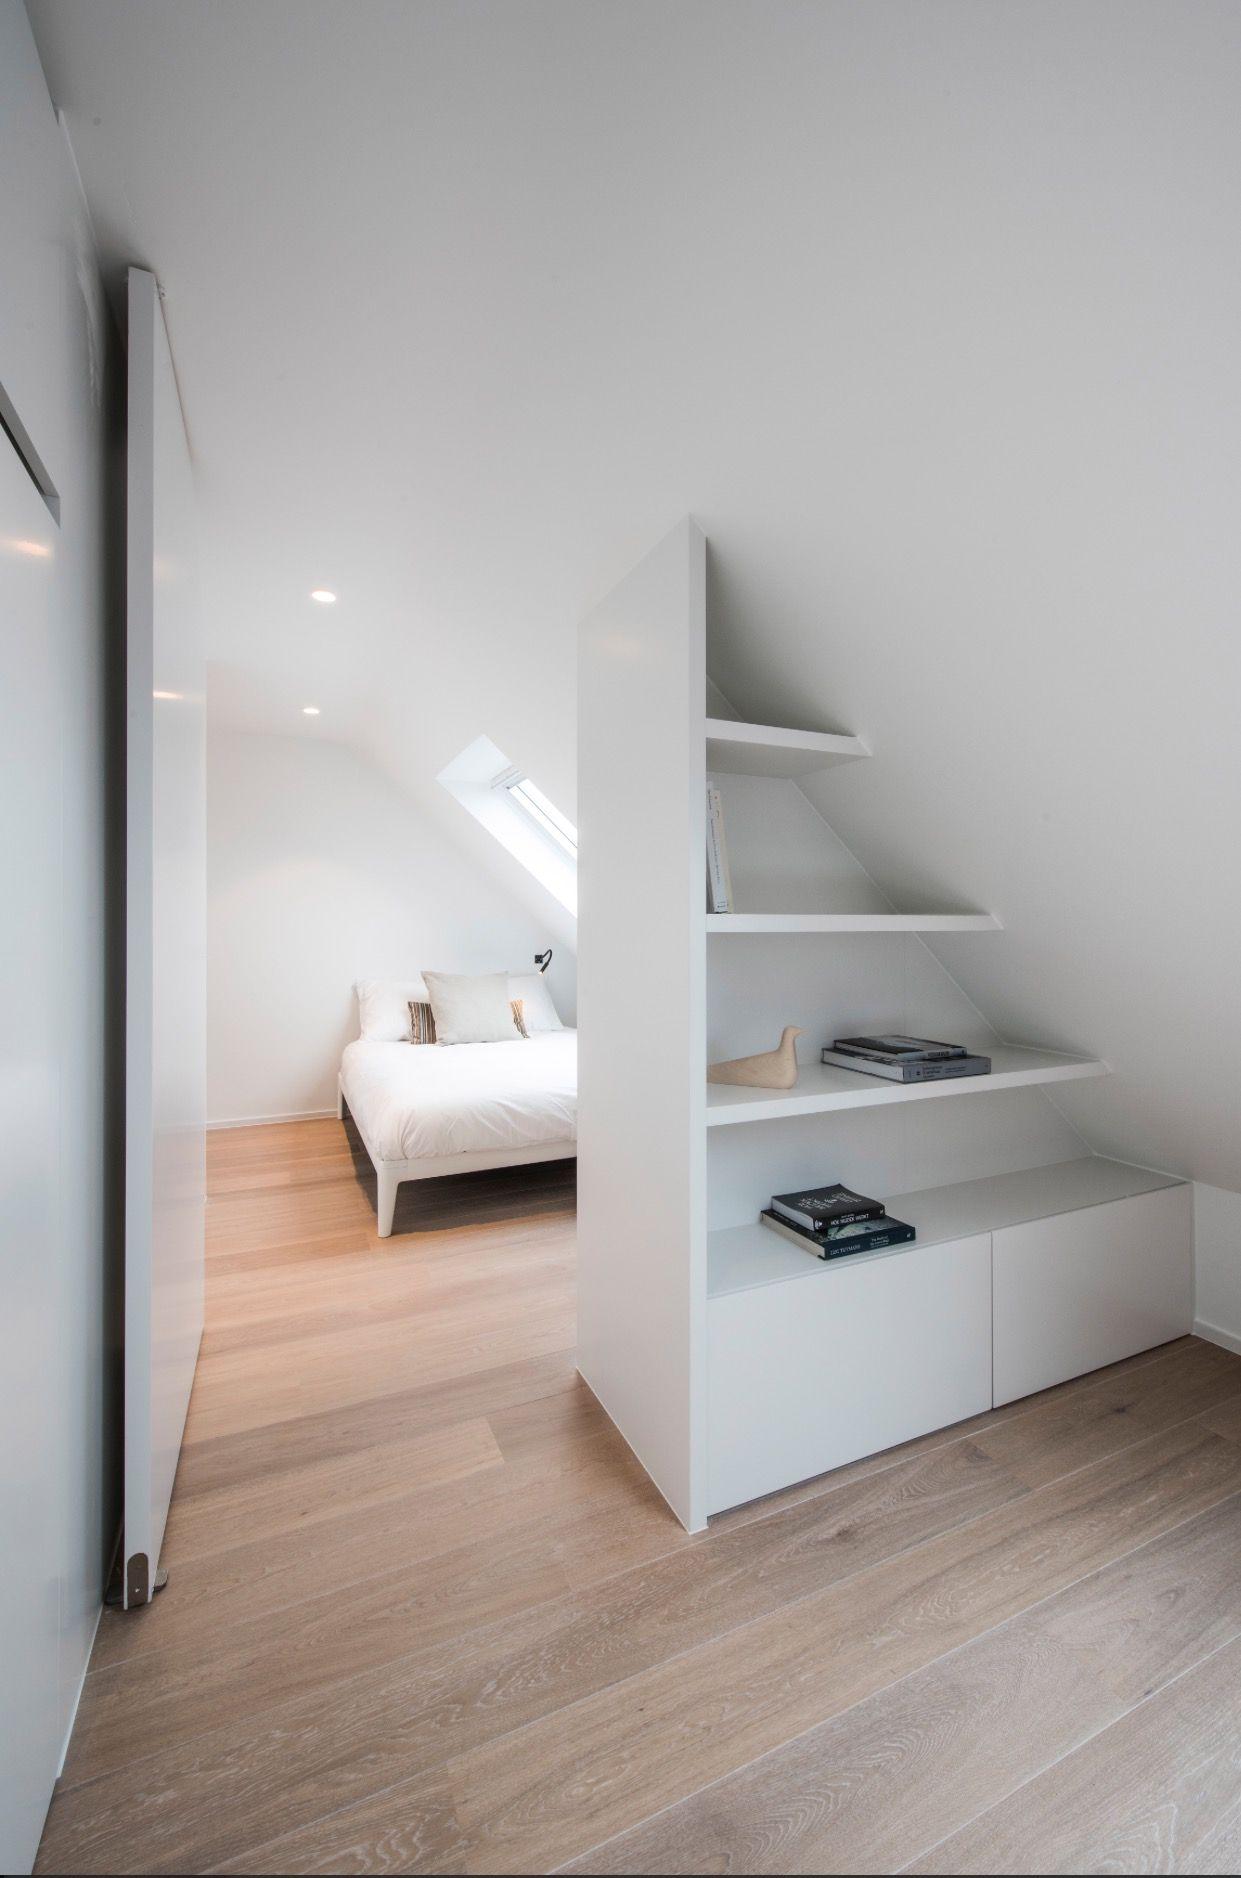 Idee Voor Langwerpige Slaapkamer Bovenverdieping Dachboden Ideen,  Schlafzimmer Dachschräge, Wohnzimmer, Dachgeschoss Schlafzimmer,